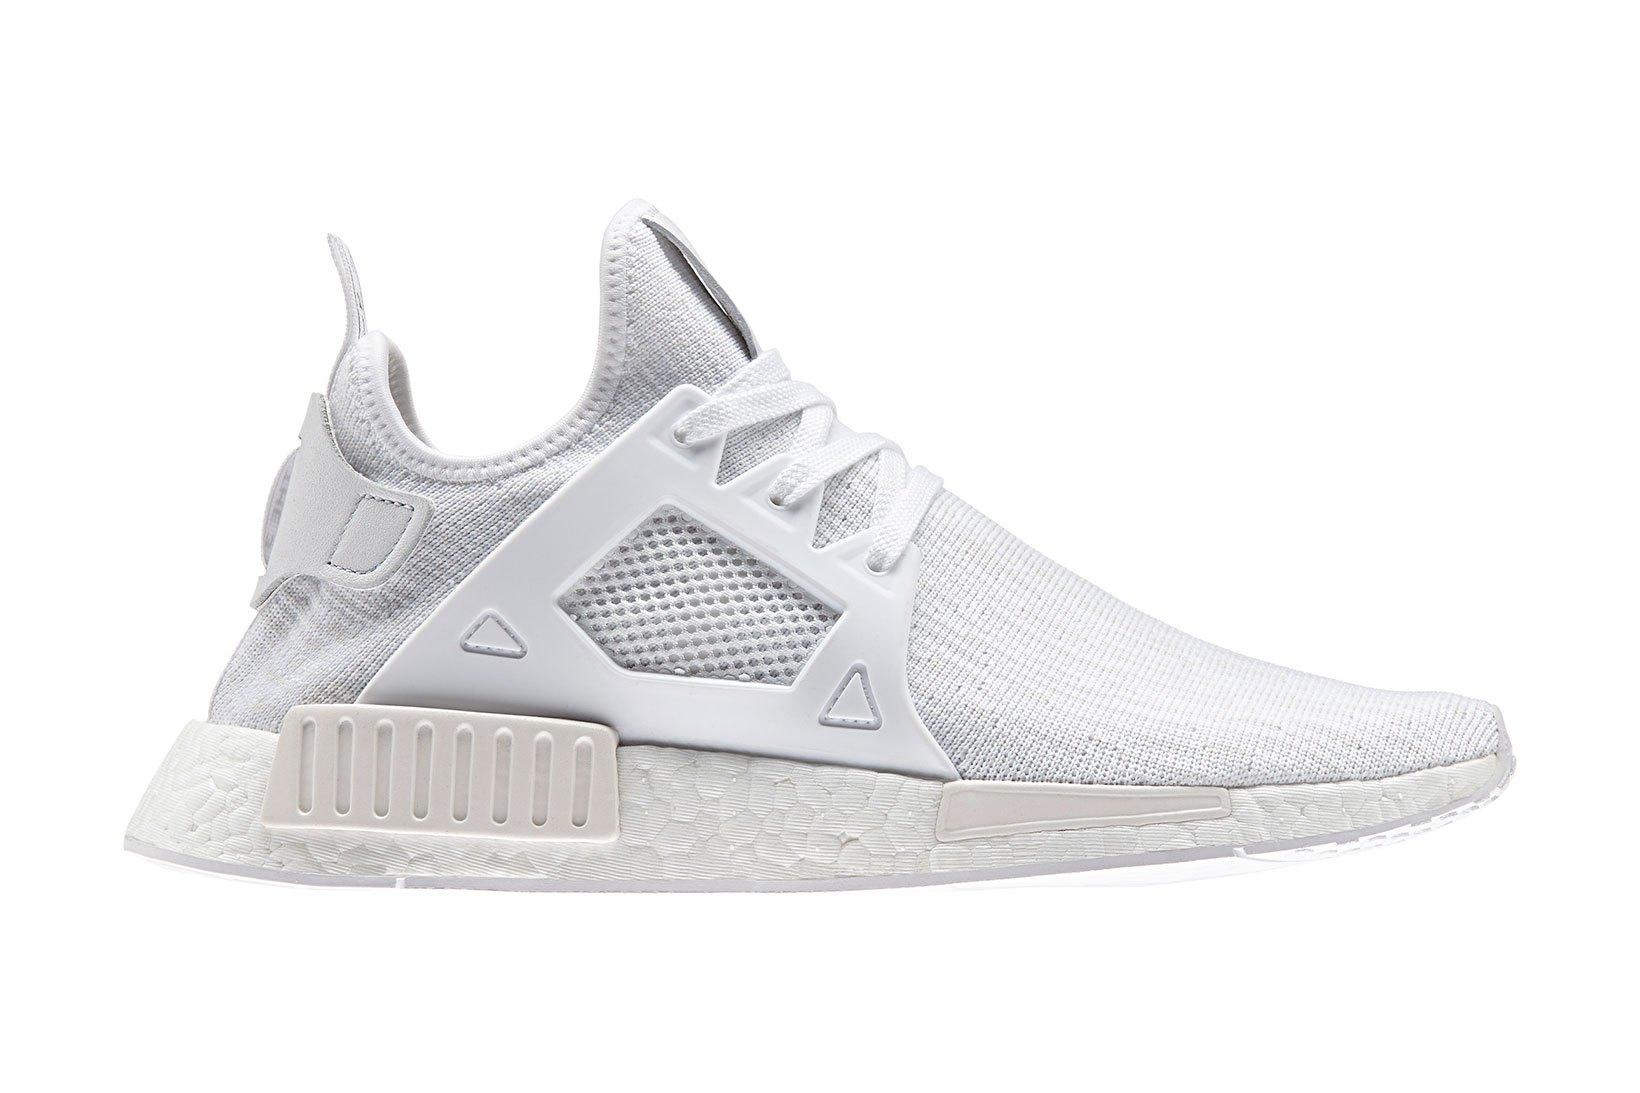 adidas-originals-nmd-xr1-white-sneaker-1